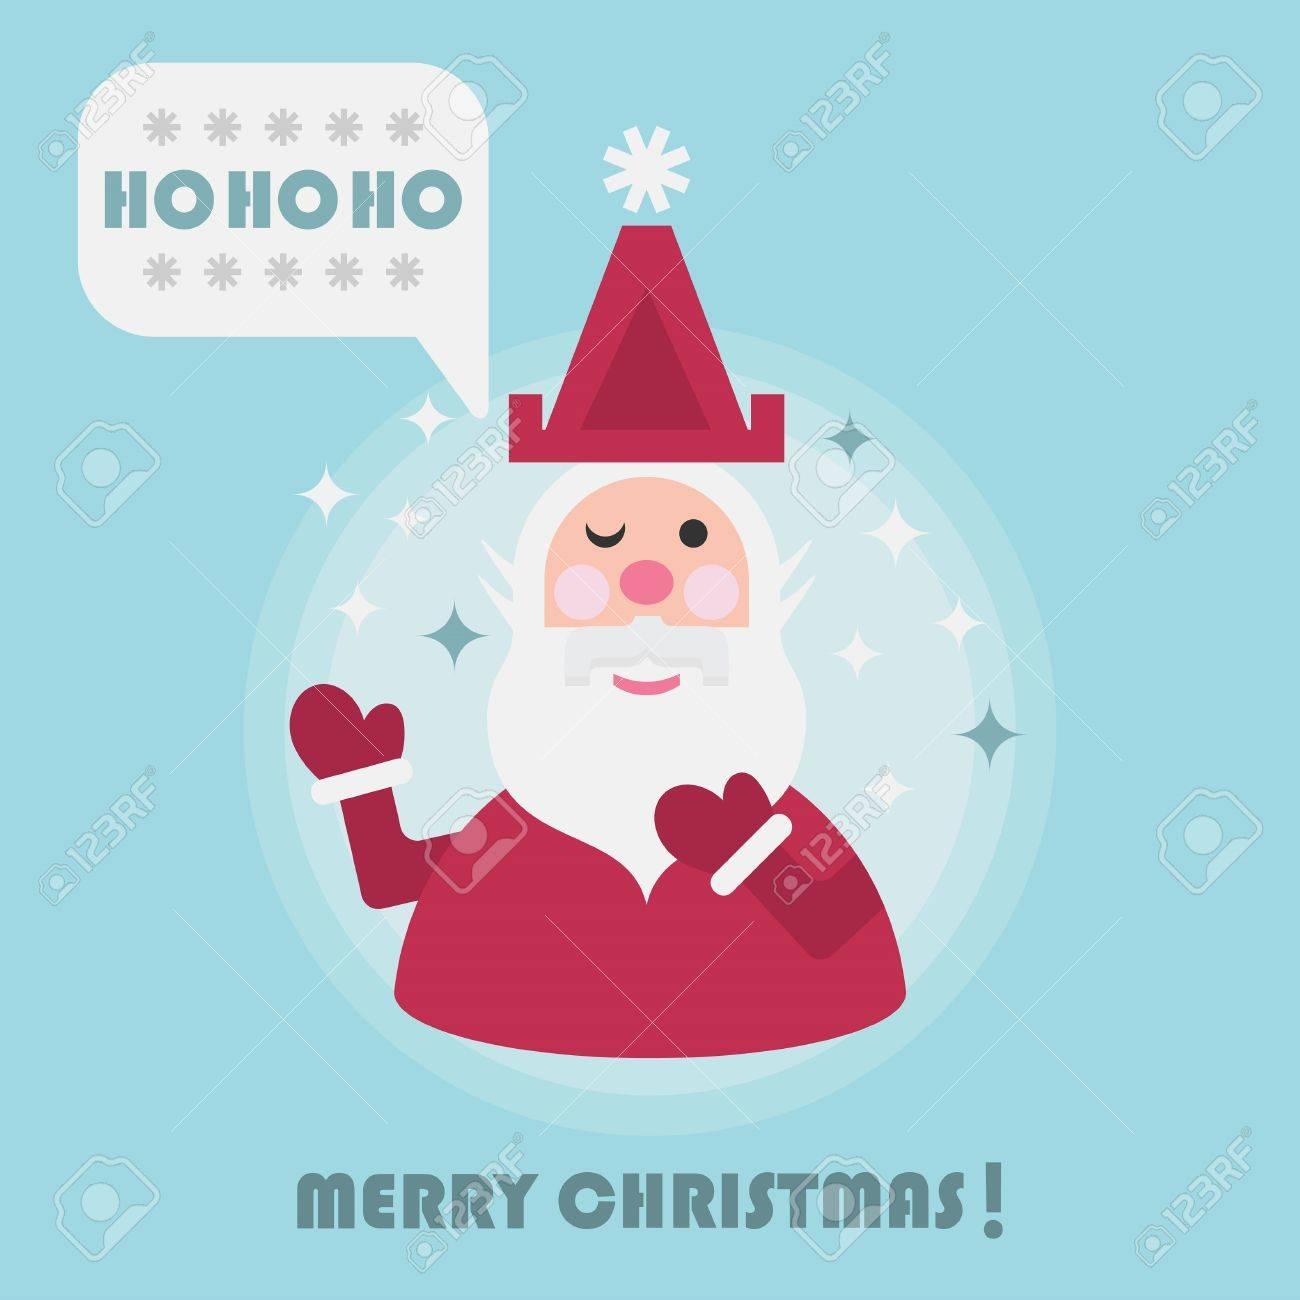 Merry Christmas Holiday Card With Cute Santa And Ho Ho Ho Speech ...